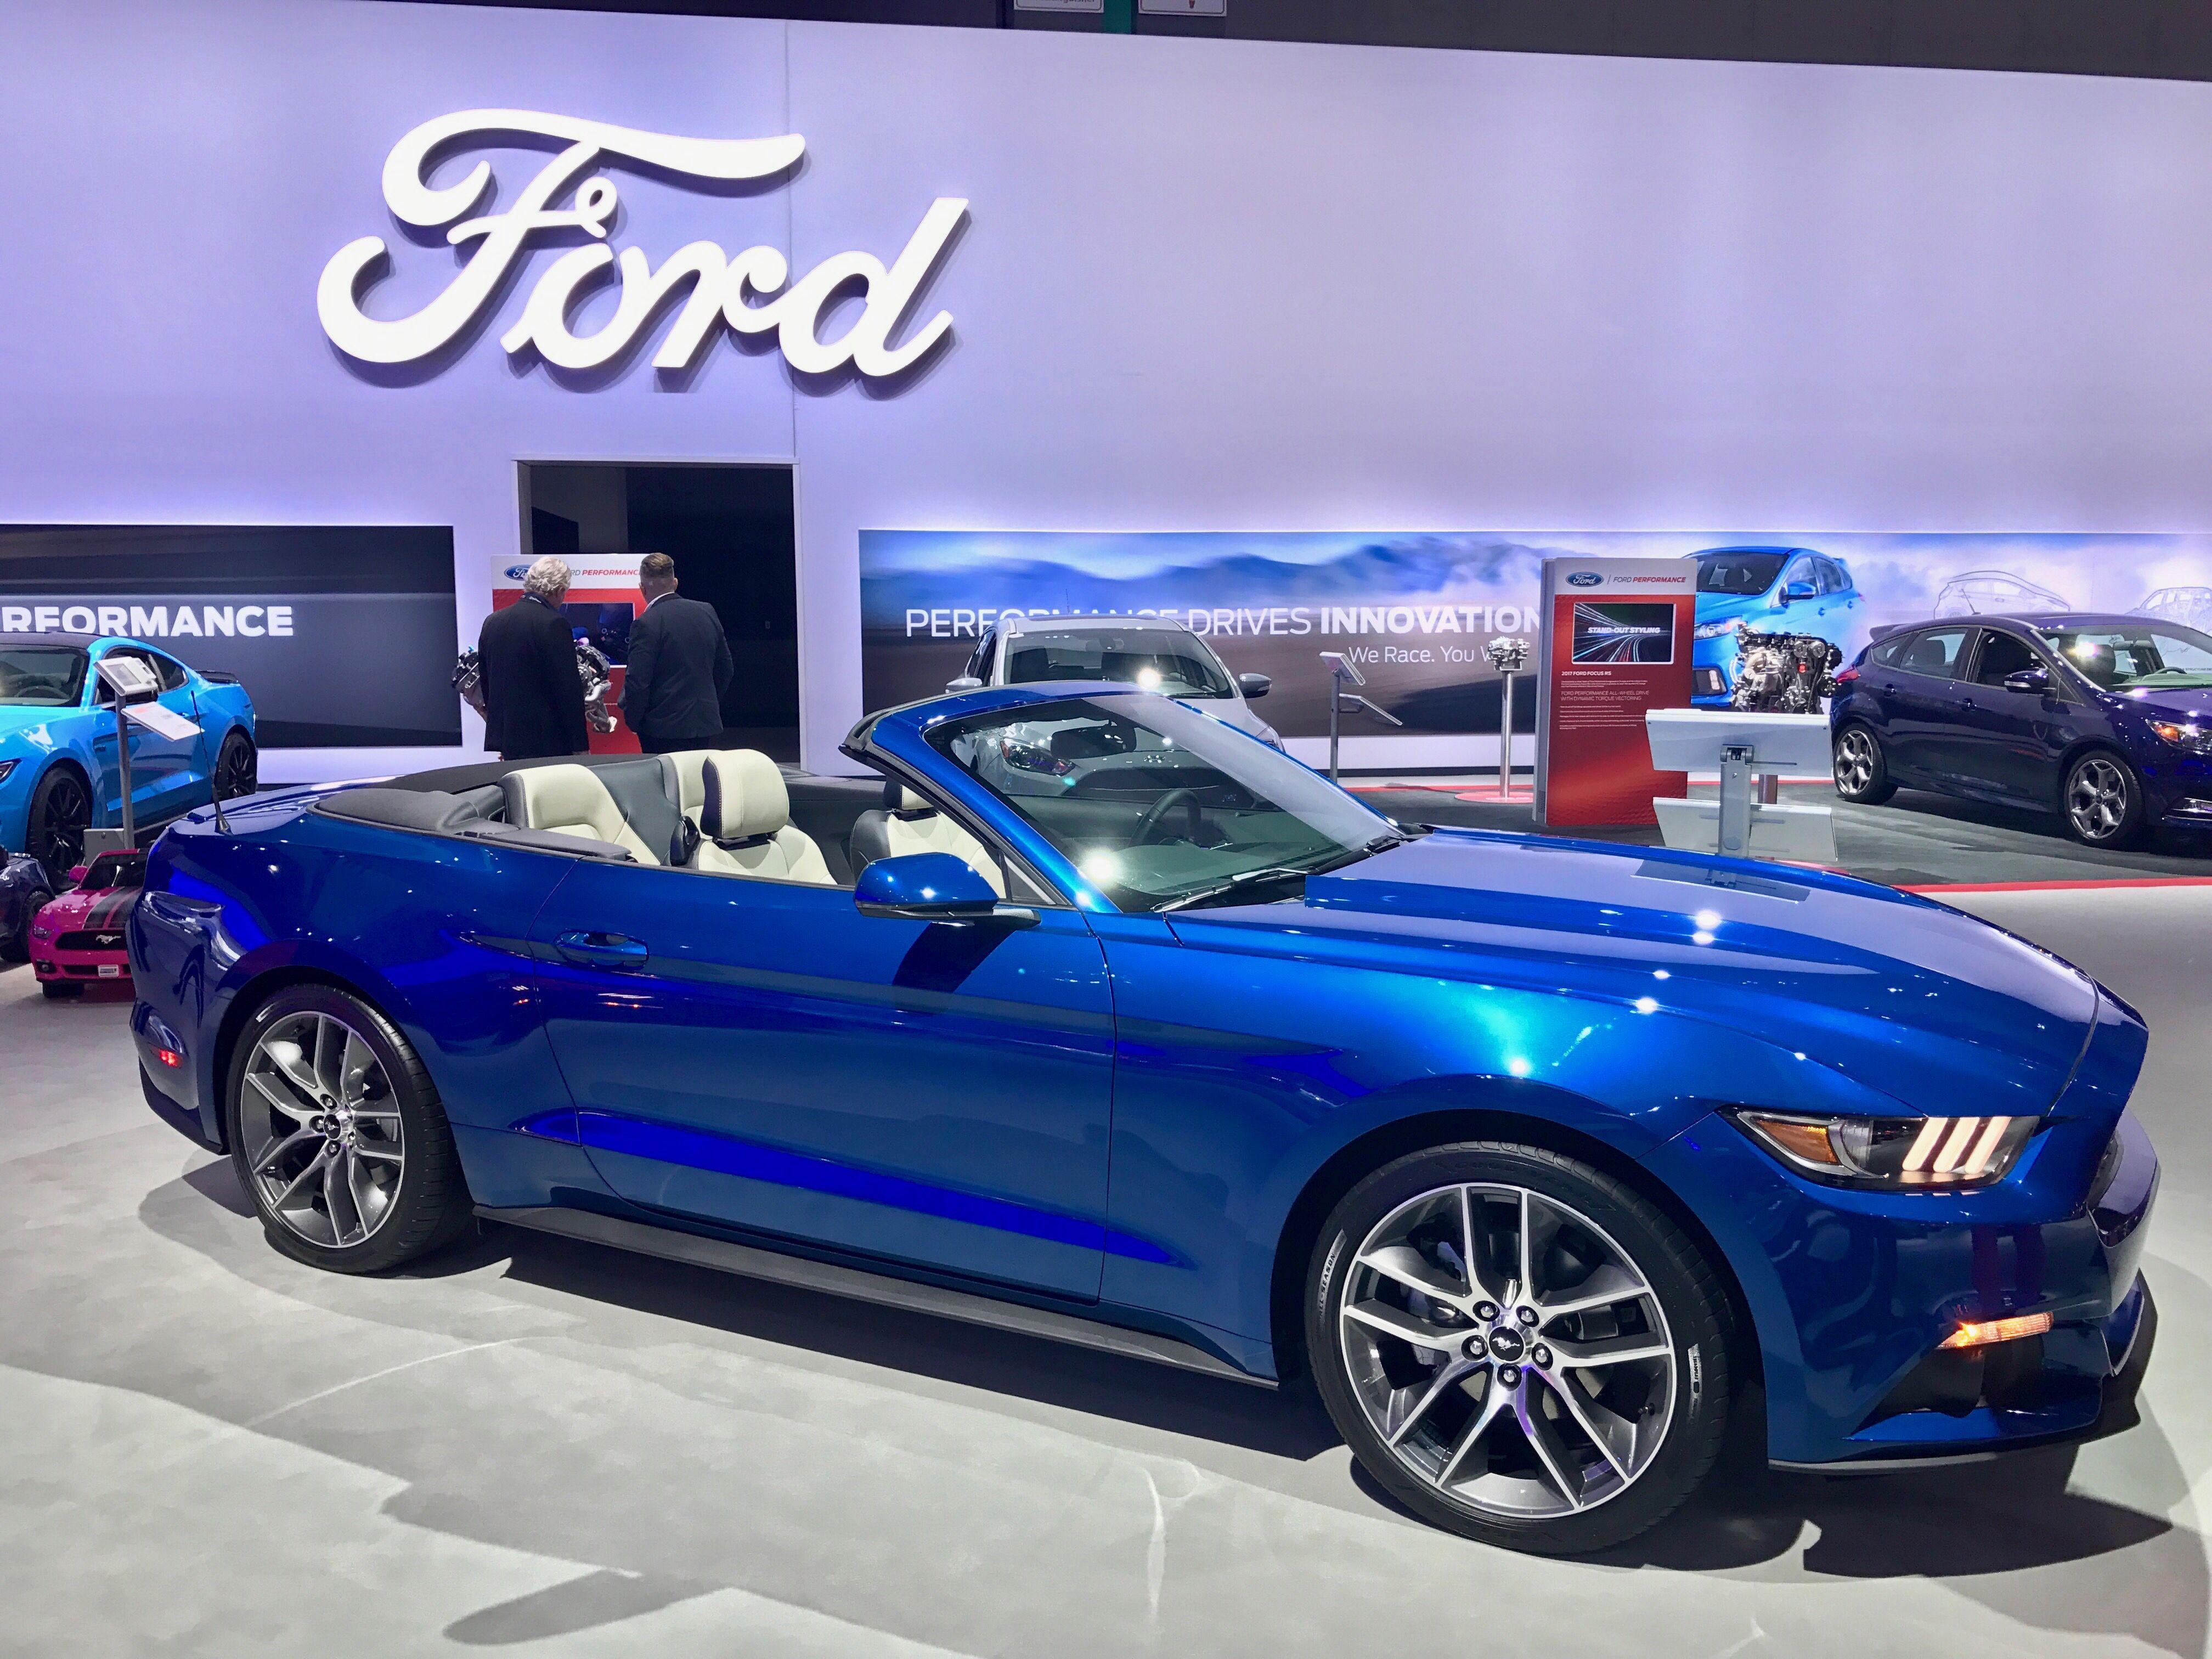 2017 2 3l ecoboost ford mustang in lightning blue i